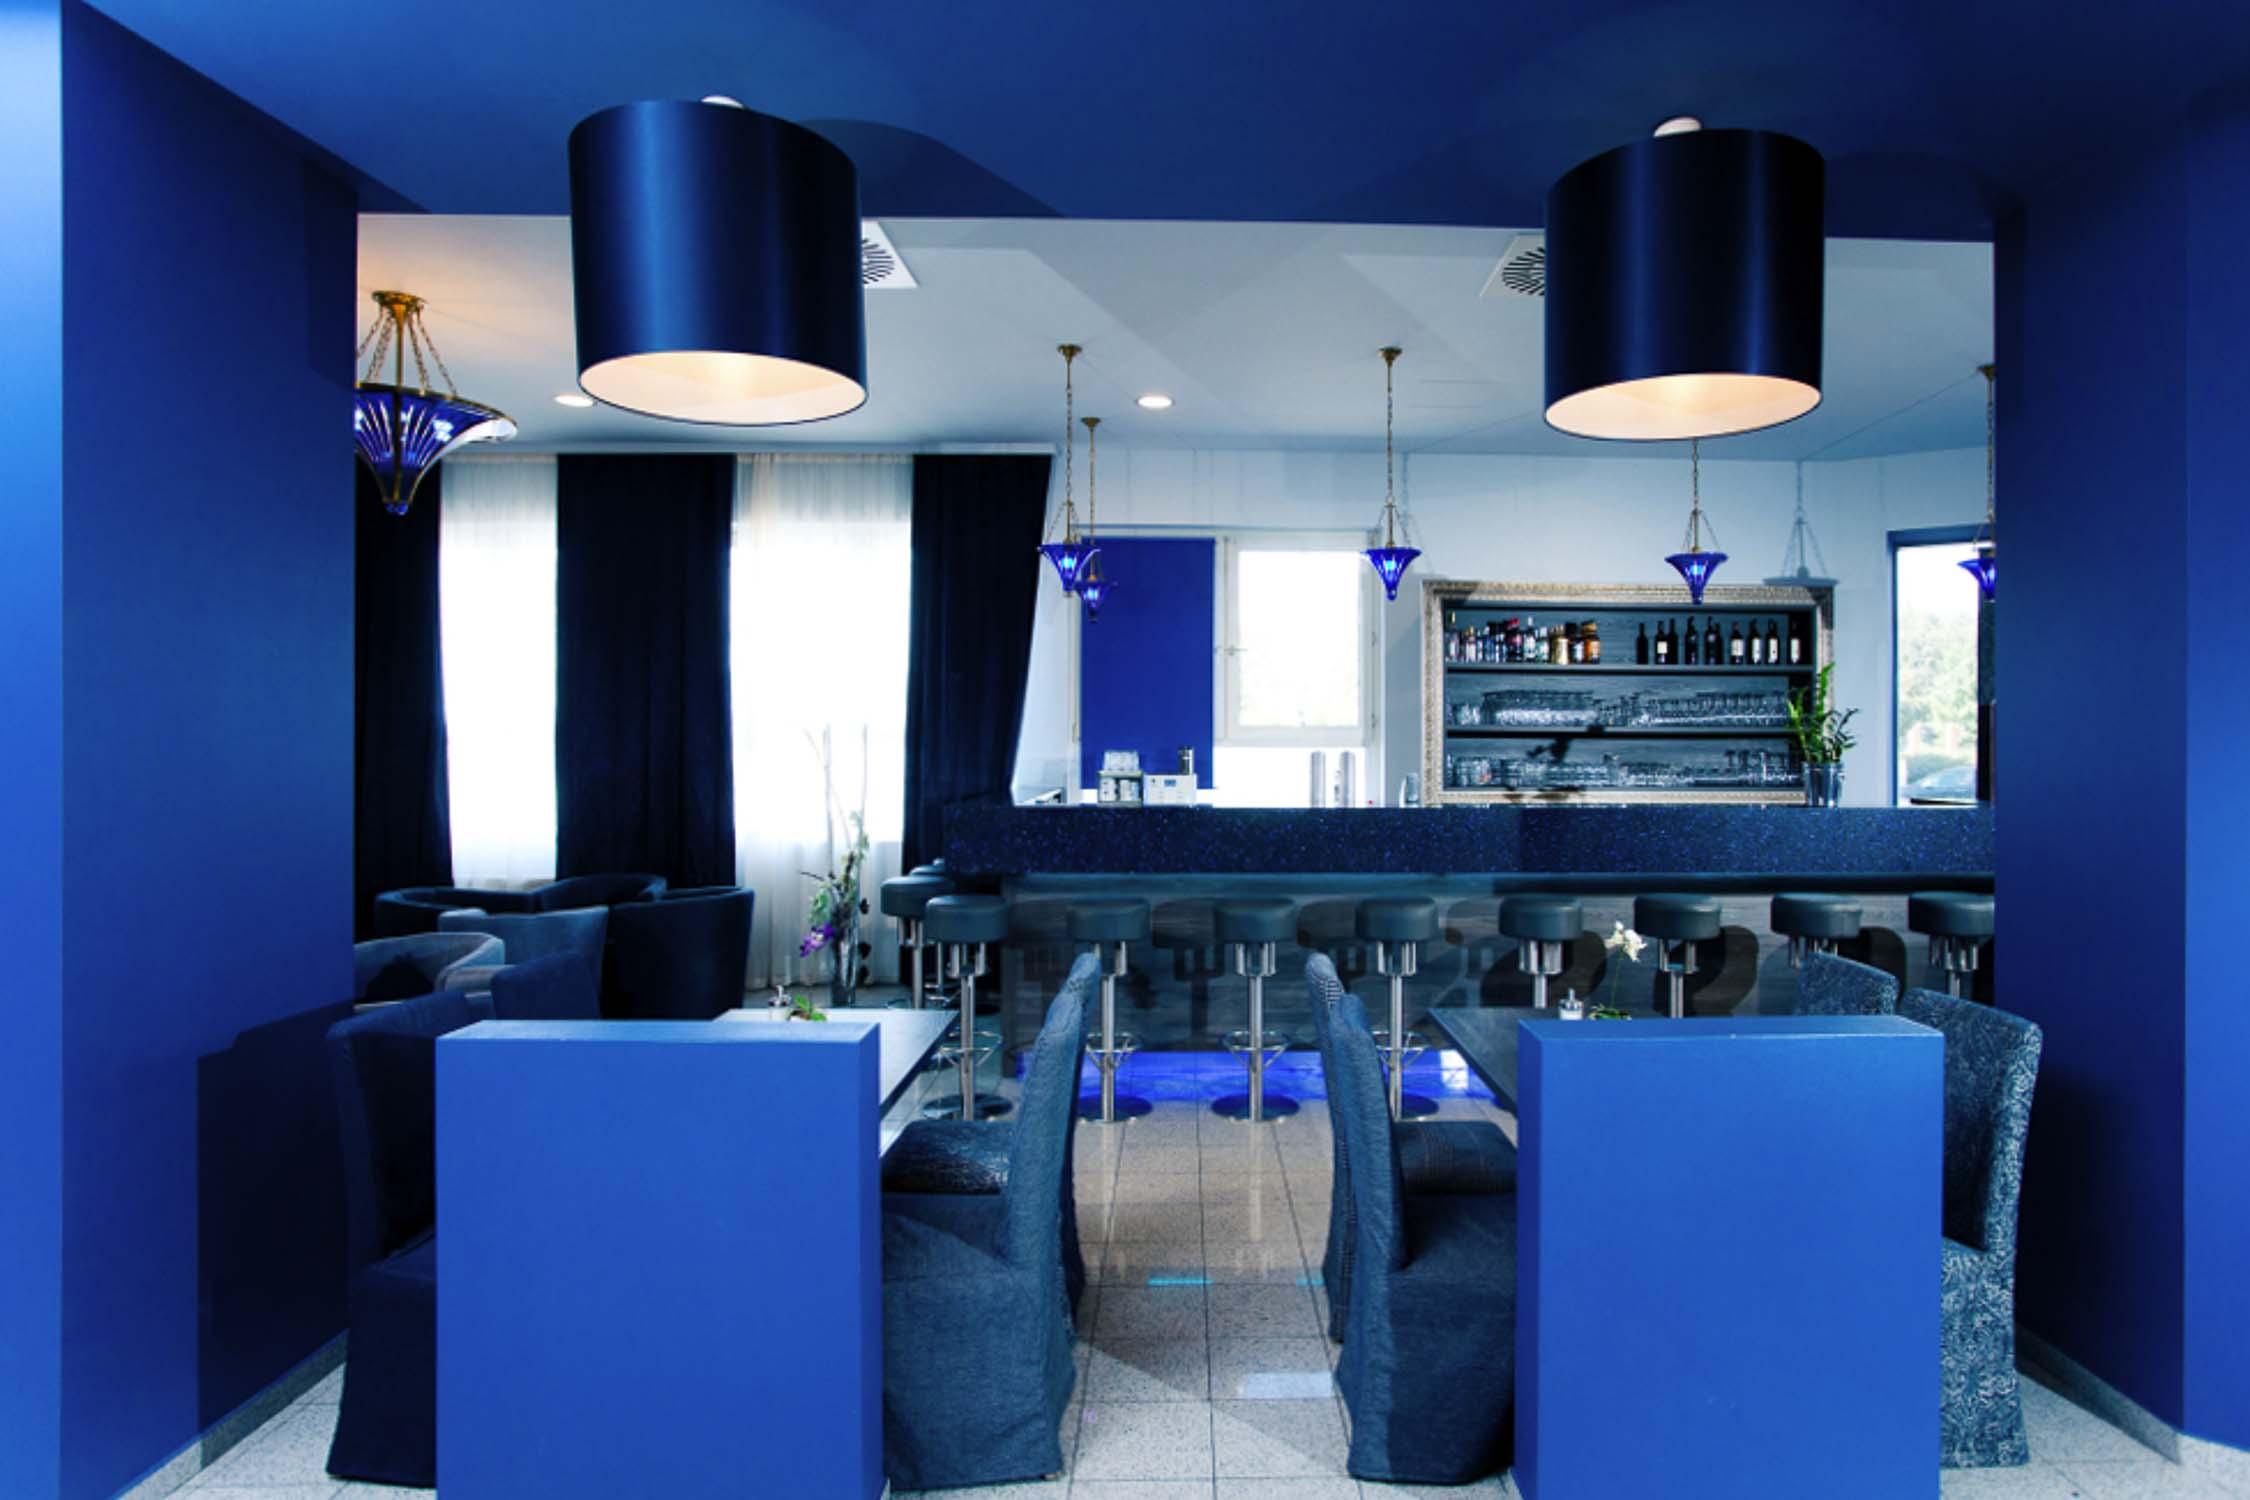 Hotelfotograf Businessfotograf  Berlin Hamburg Restaurantfotograf - 0120.jpg